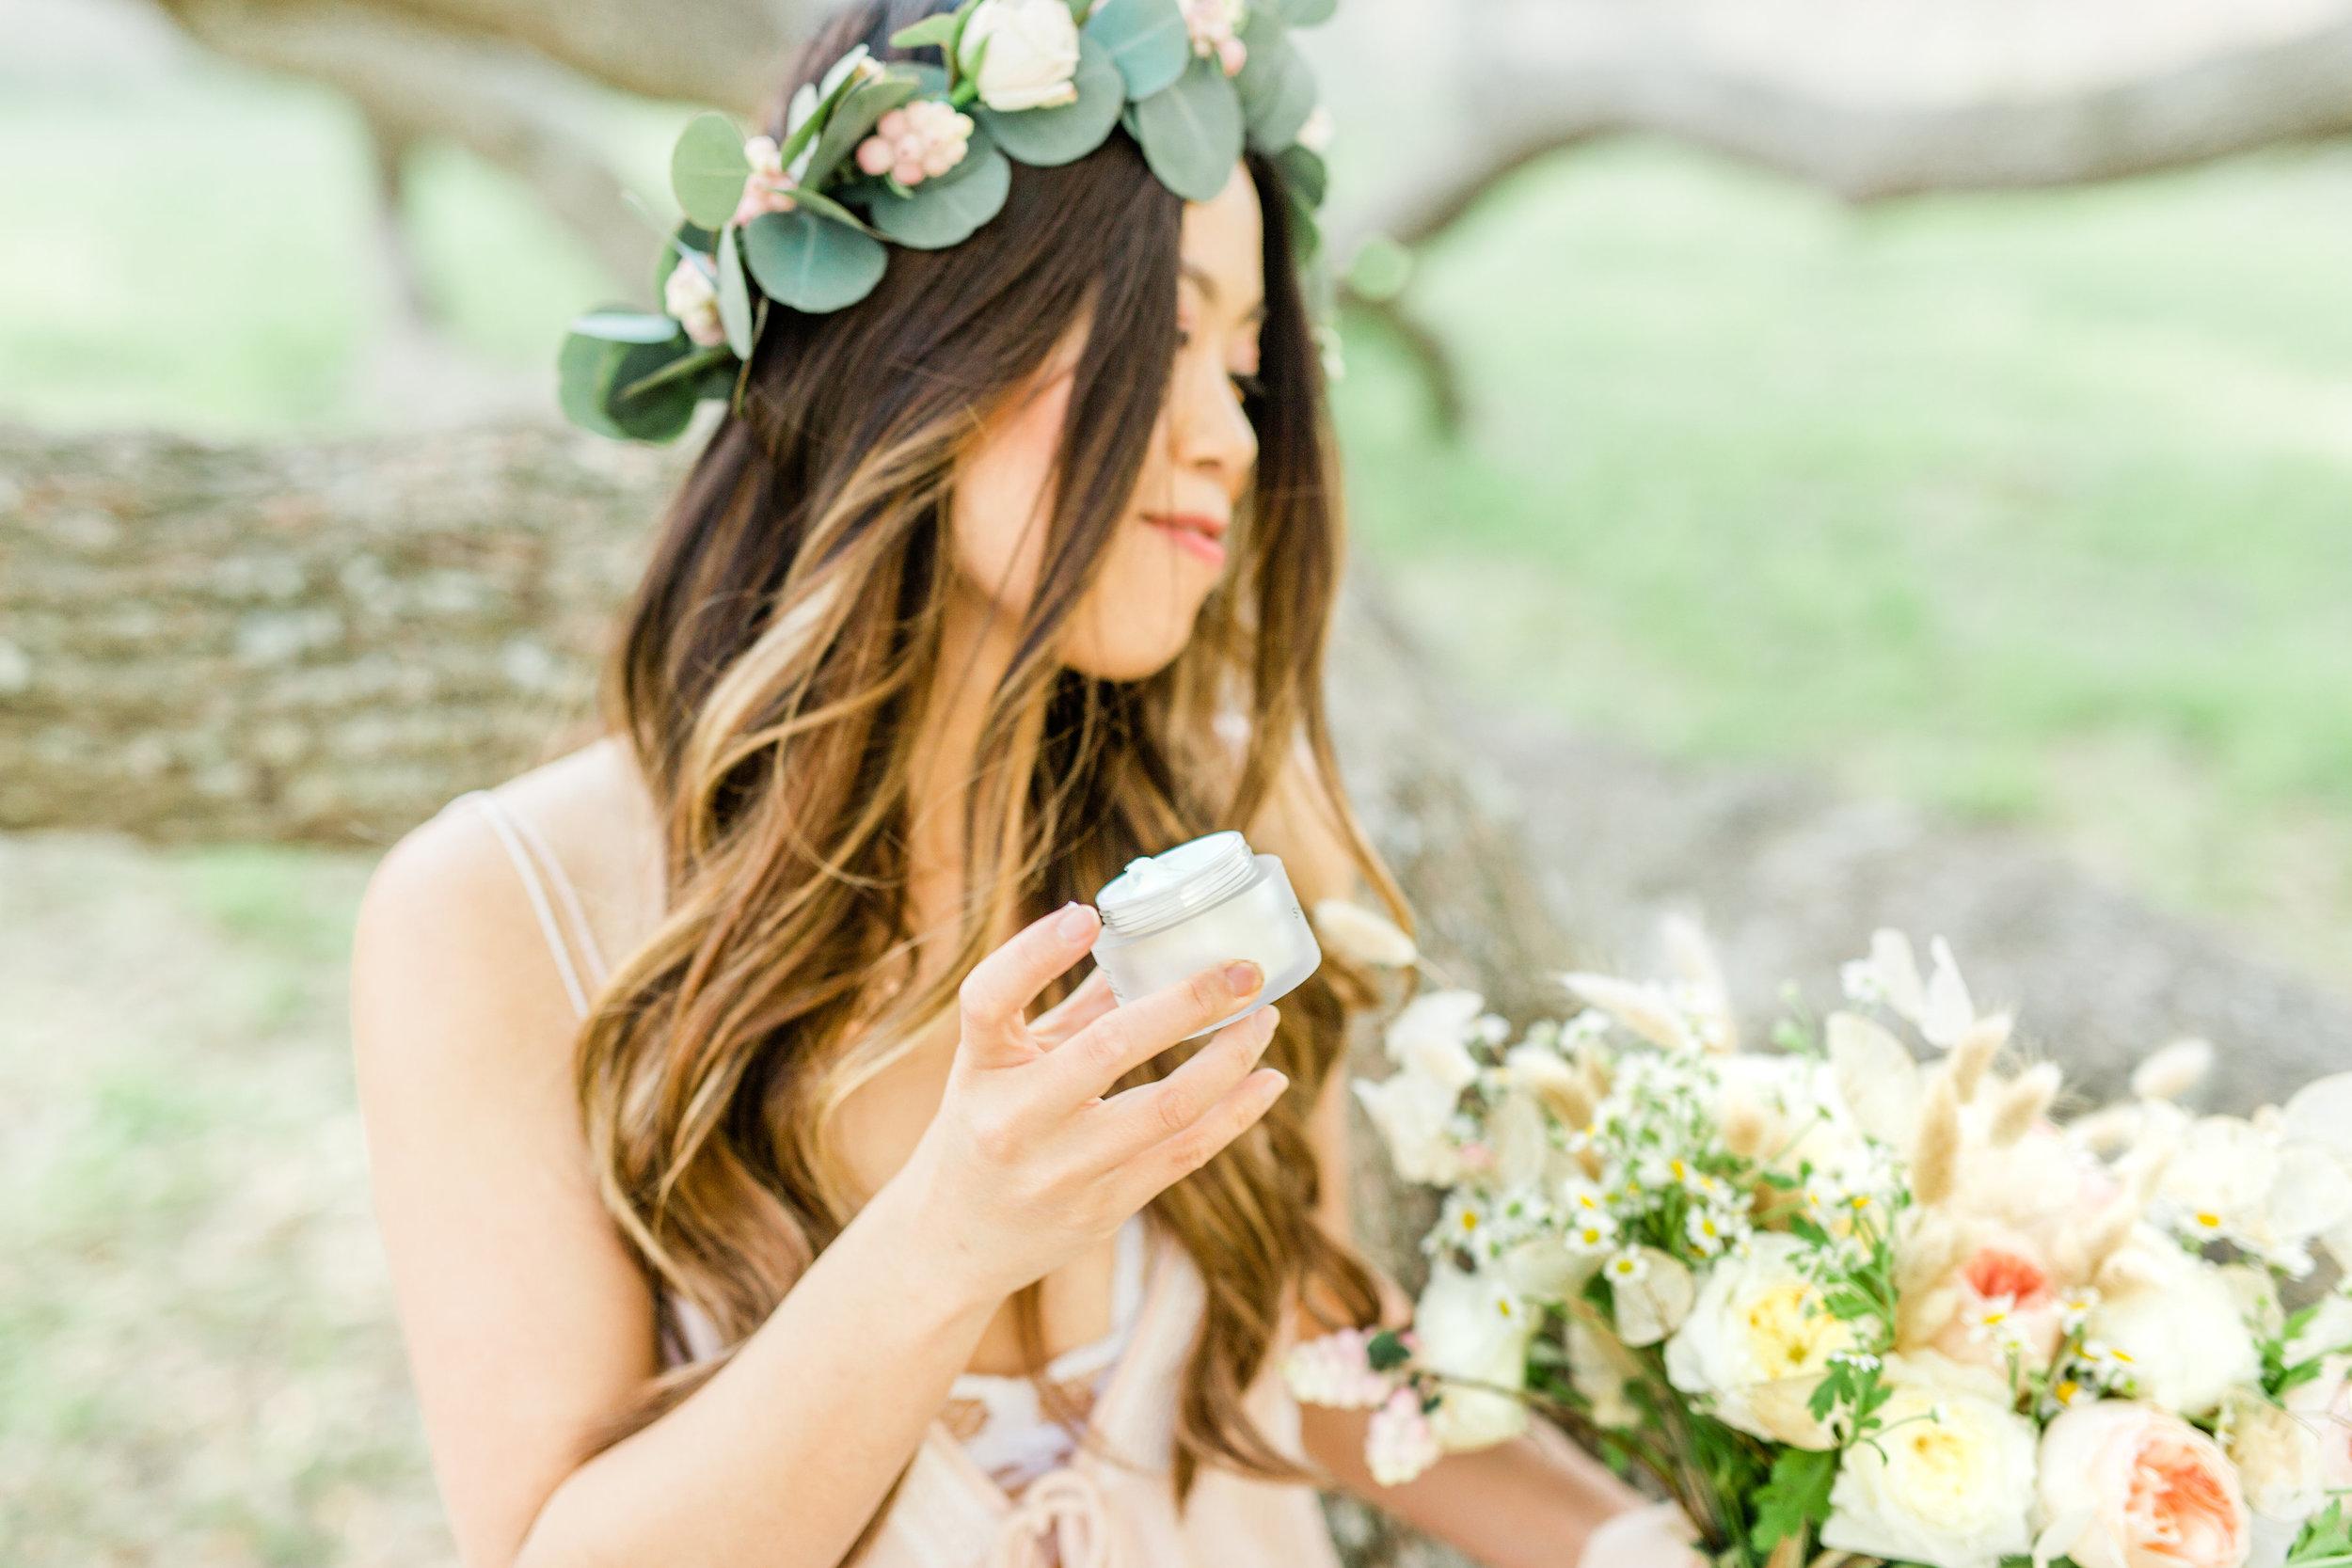 Shortlist Best of 2018 Clean Beauty Retinol Cream and anti aging Serum Review Joyfullygreen